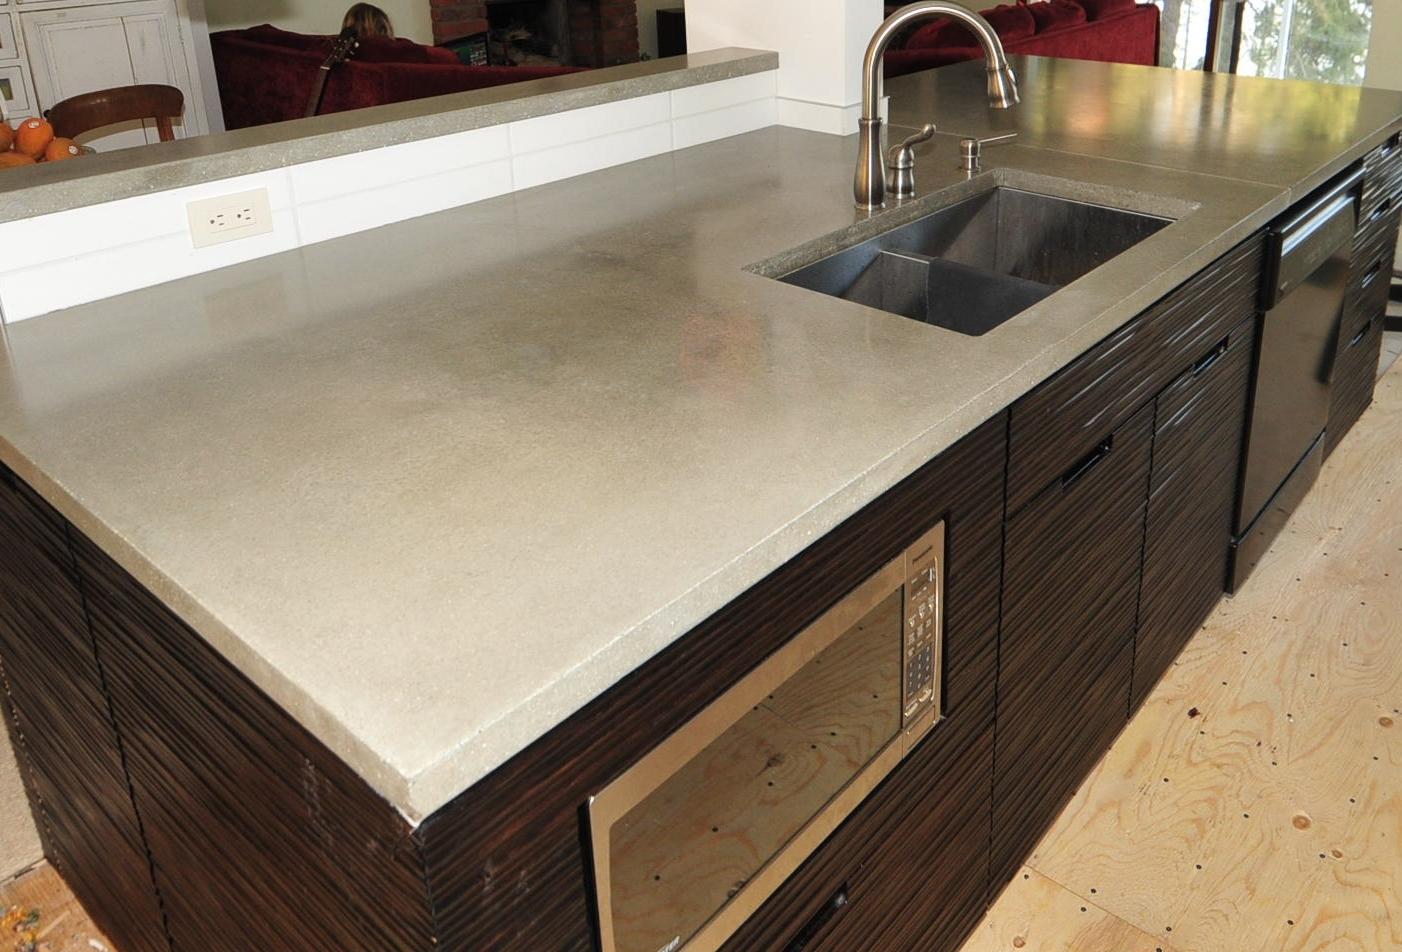 concrete countertops in modern kitchen modern kitchen countertops Ultra Chic and Modern Concrete Kitchen Countertops made in the Okanagan